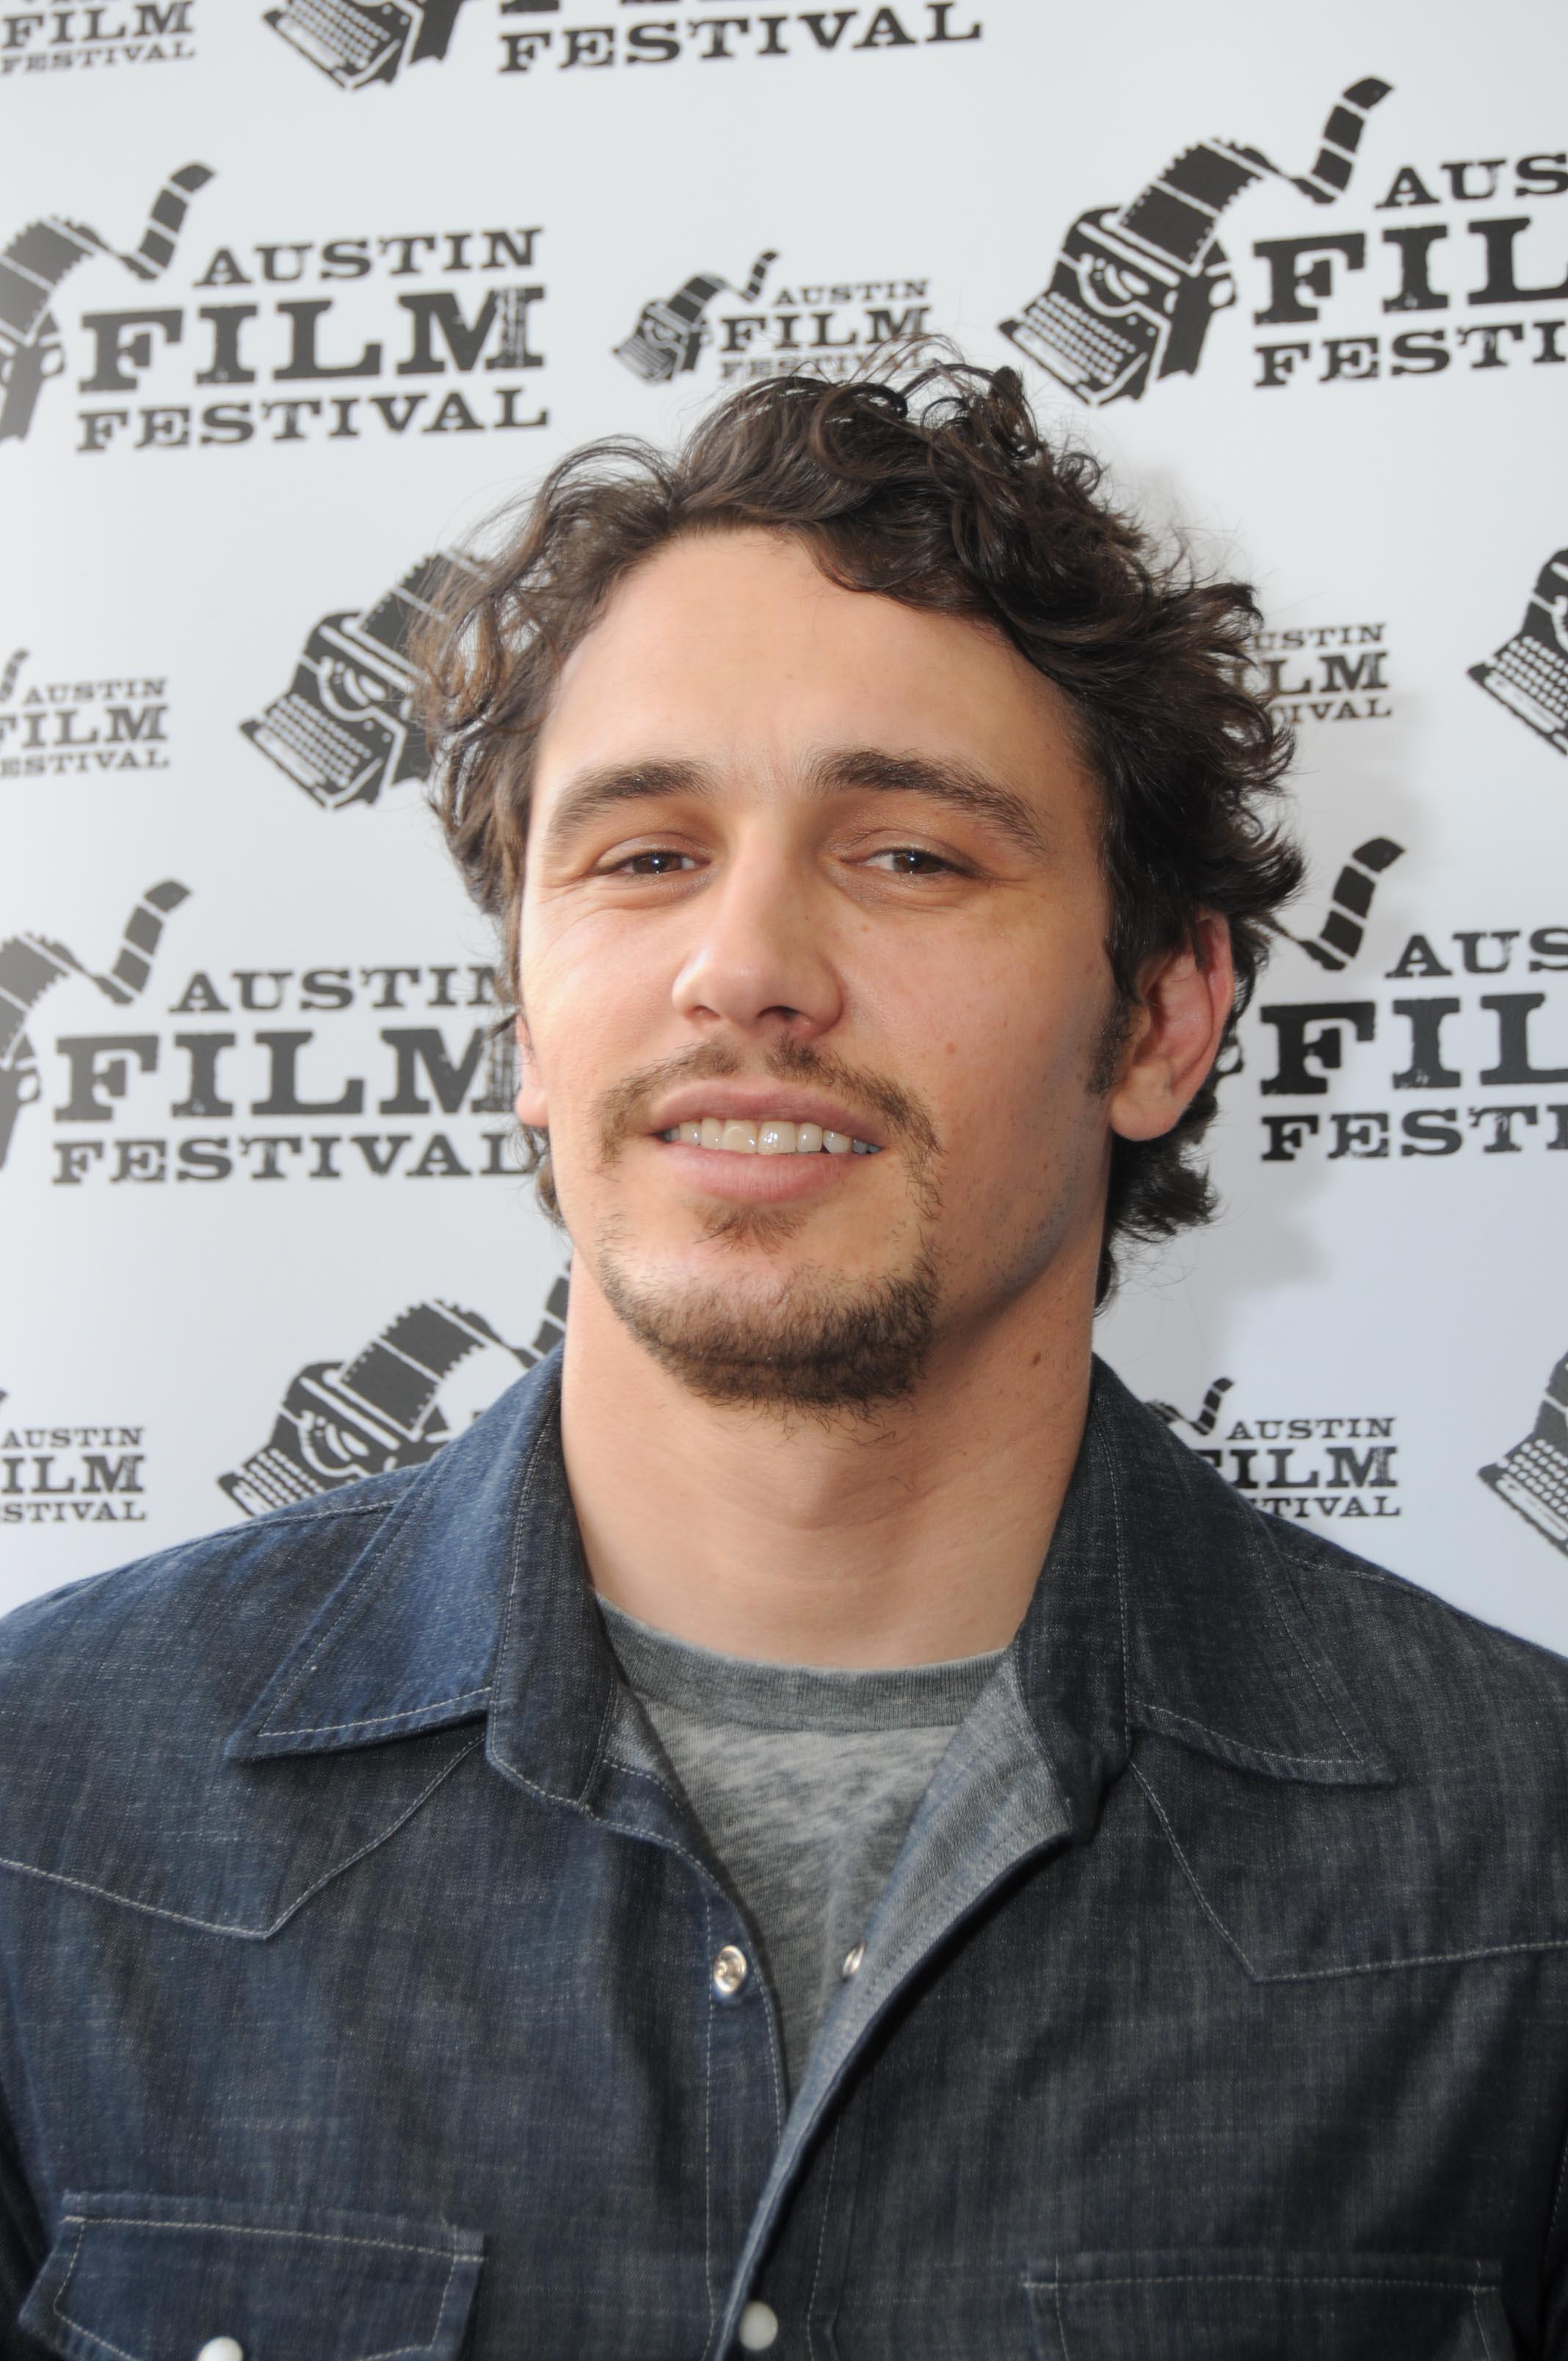 James Franco at the Austin film festival